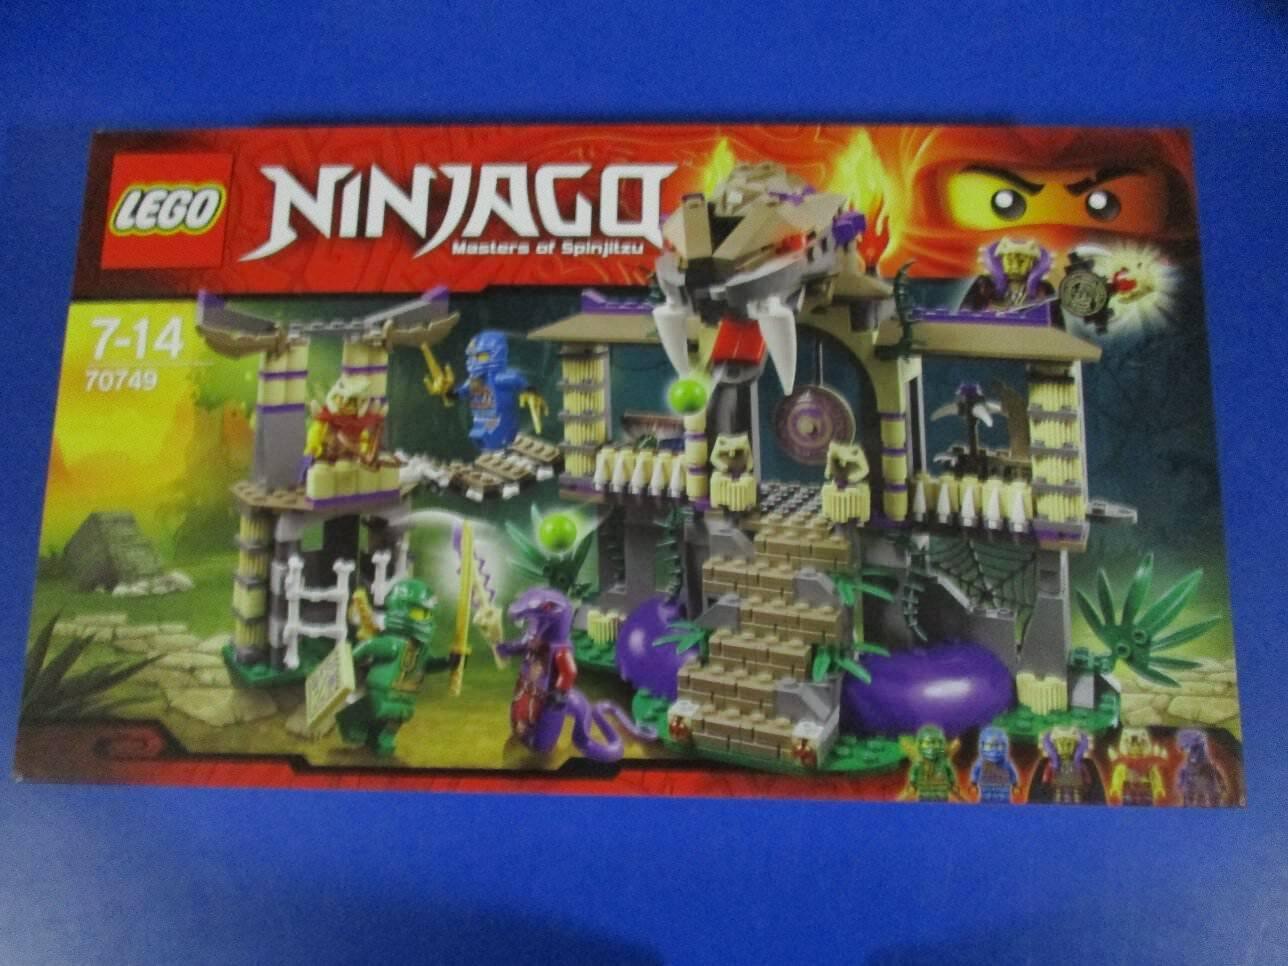 Lego Ninjago 70749 templo de la anacondrai nuevo embalaje original